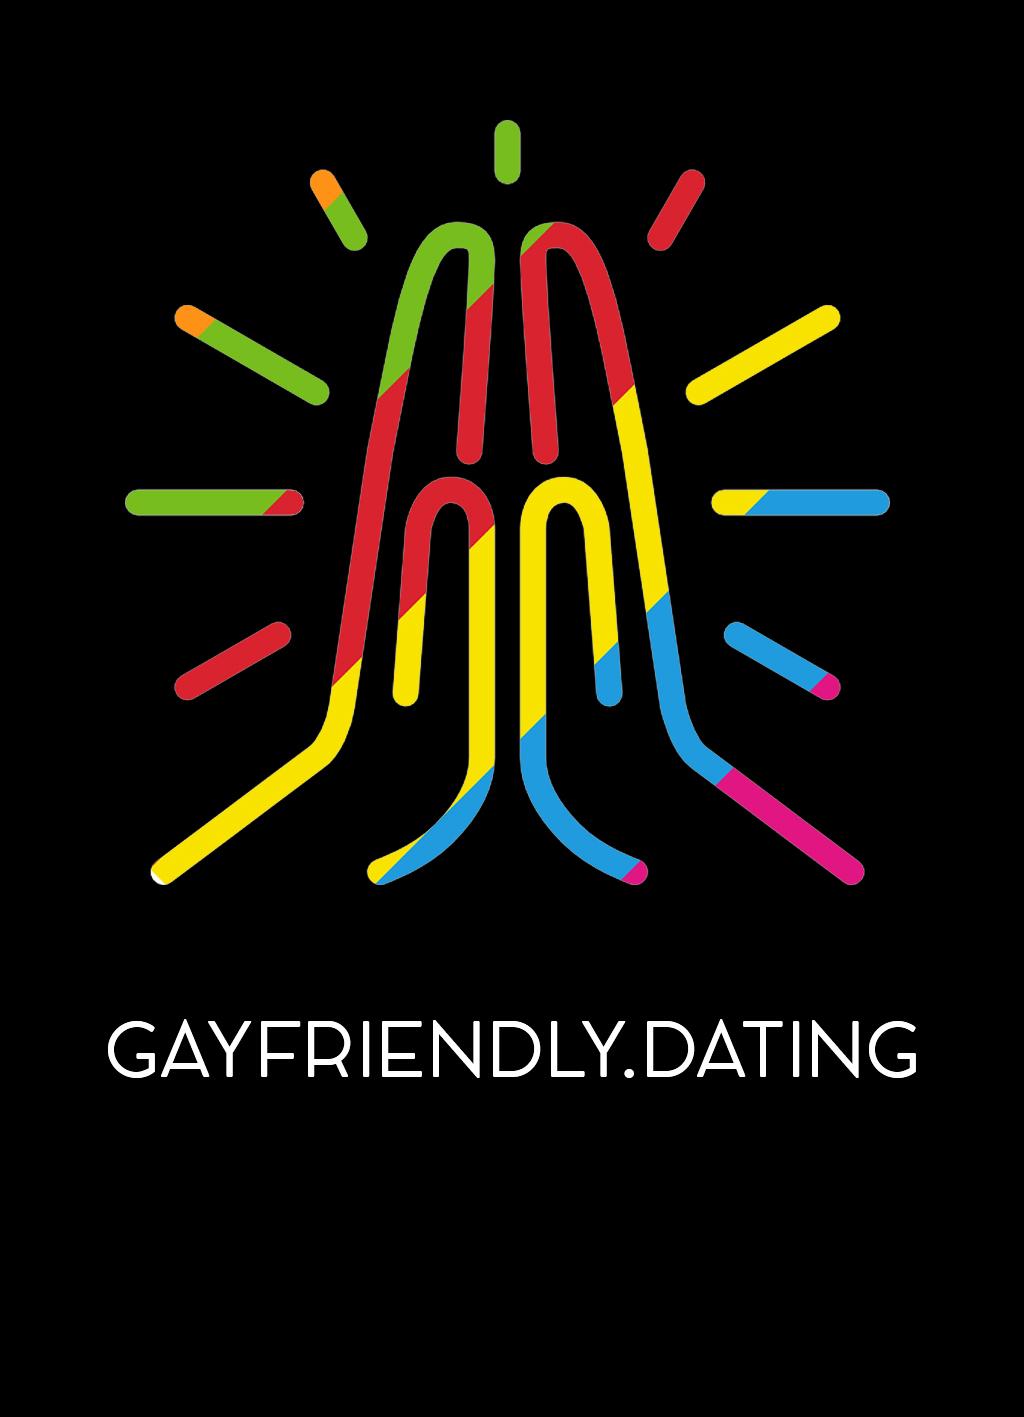 Разработать логотип для англоязычн. сайта знакомств для геев фото f_9335b4ef6dd38431.jpg